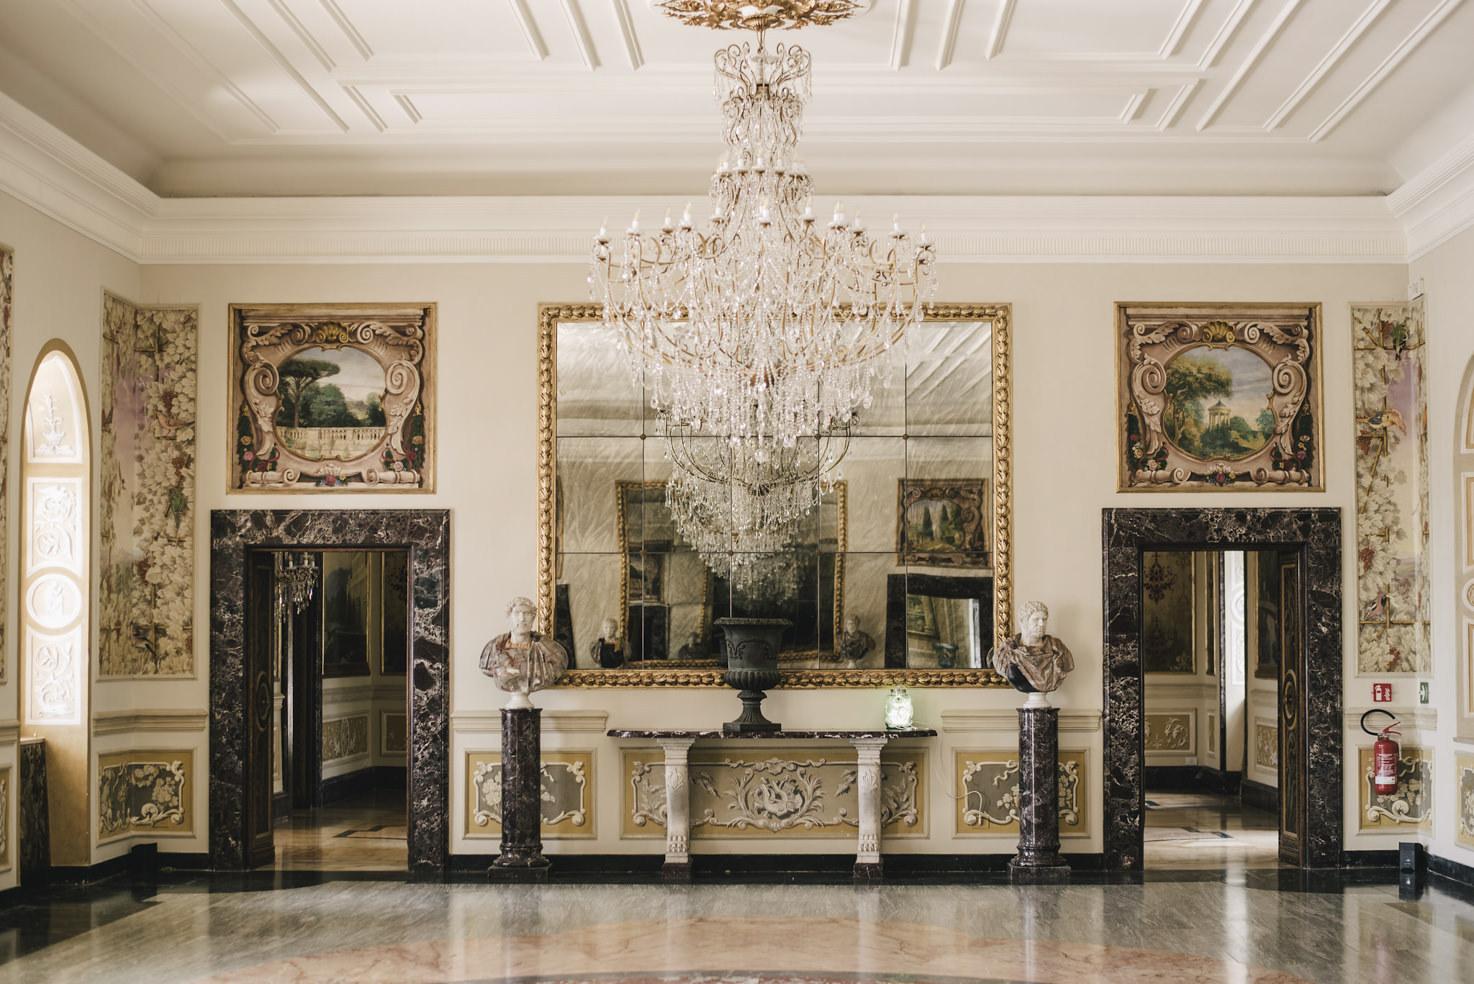 Decorated Hall at Villa Miani